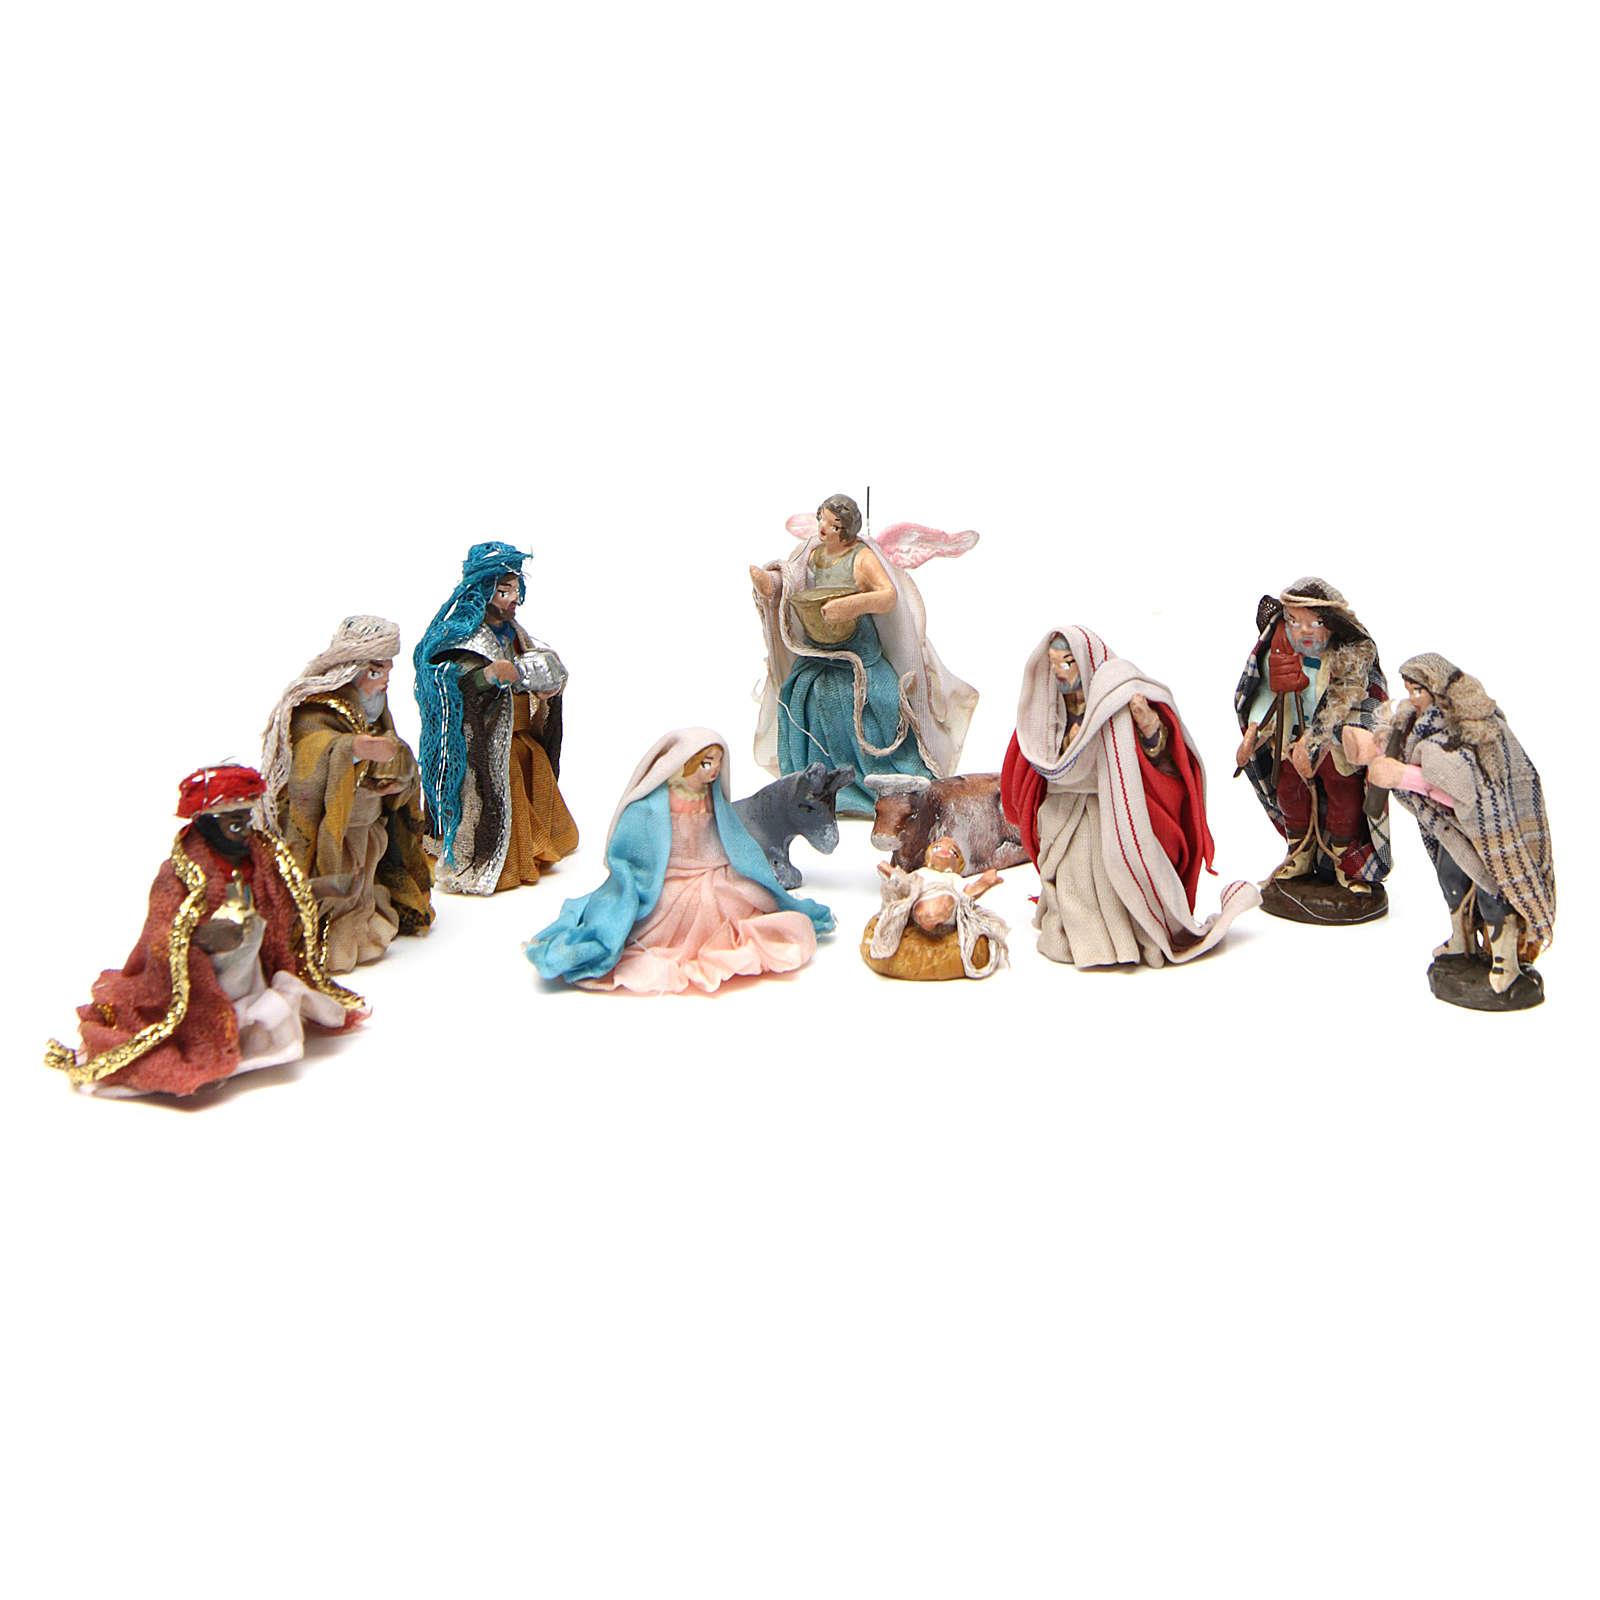 Complete Neapolitan Nativity Scene in terracotta 4 cm 11 pieces 4